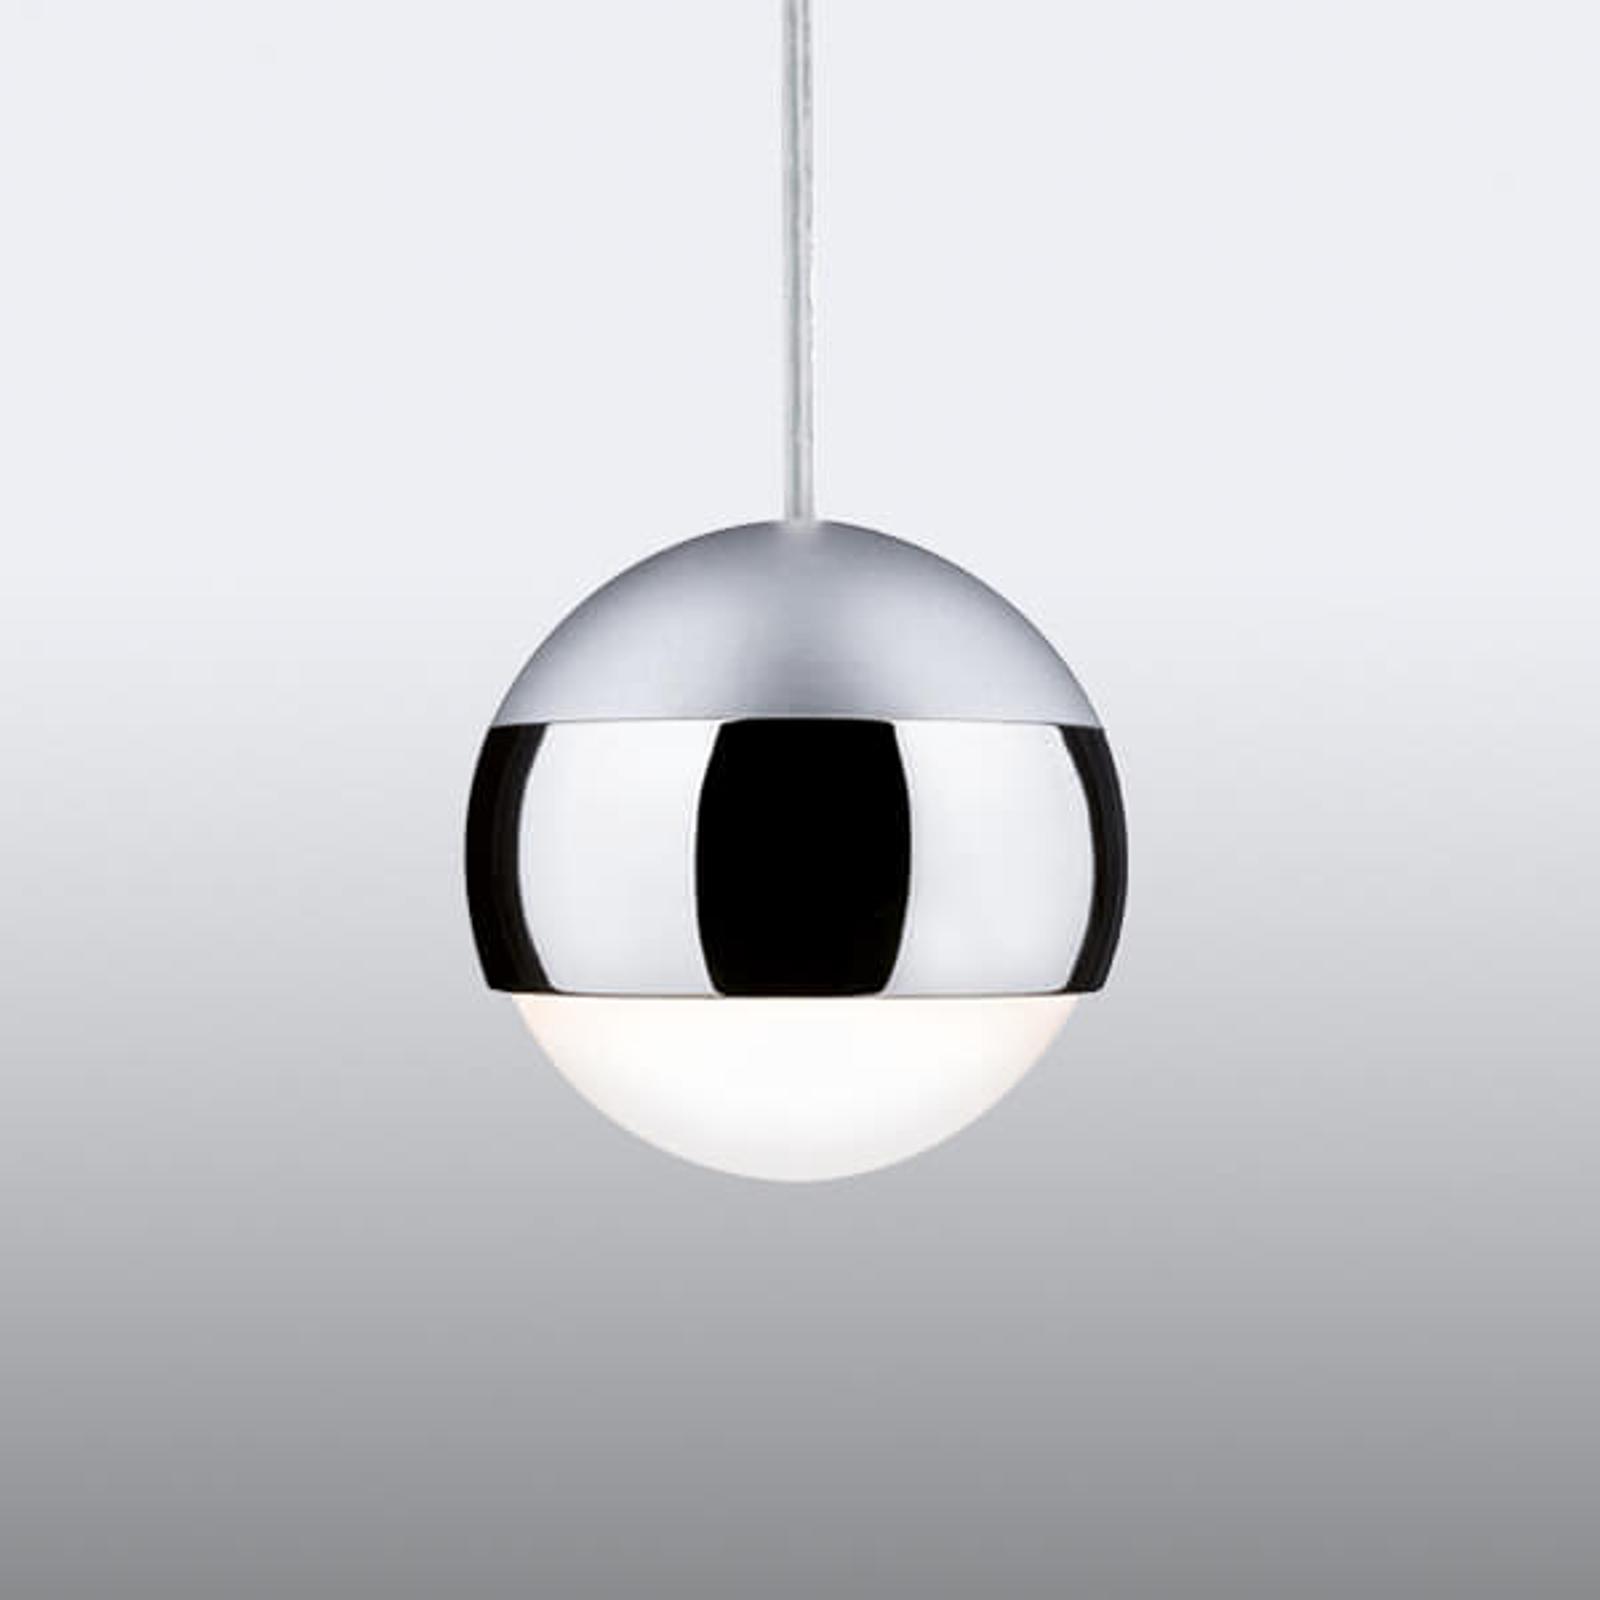 Paulmann URail Capsule II lampa wisząca LED, chrom